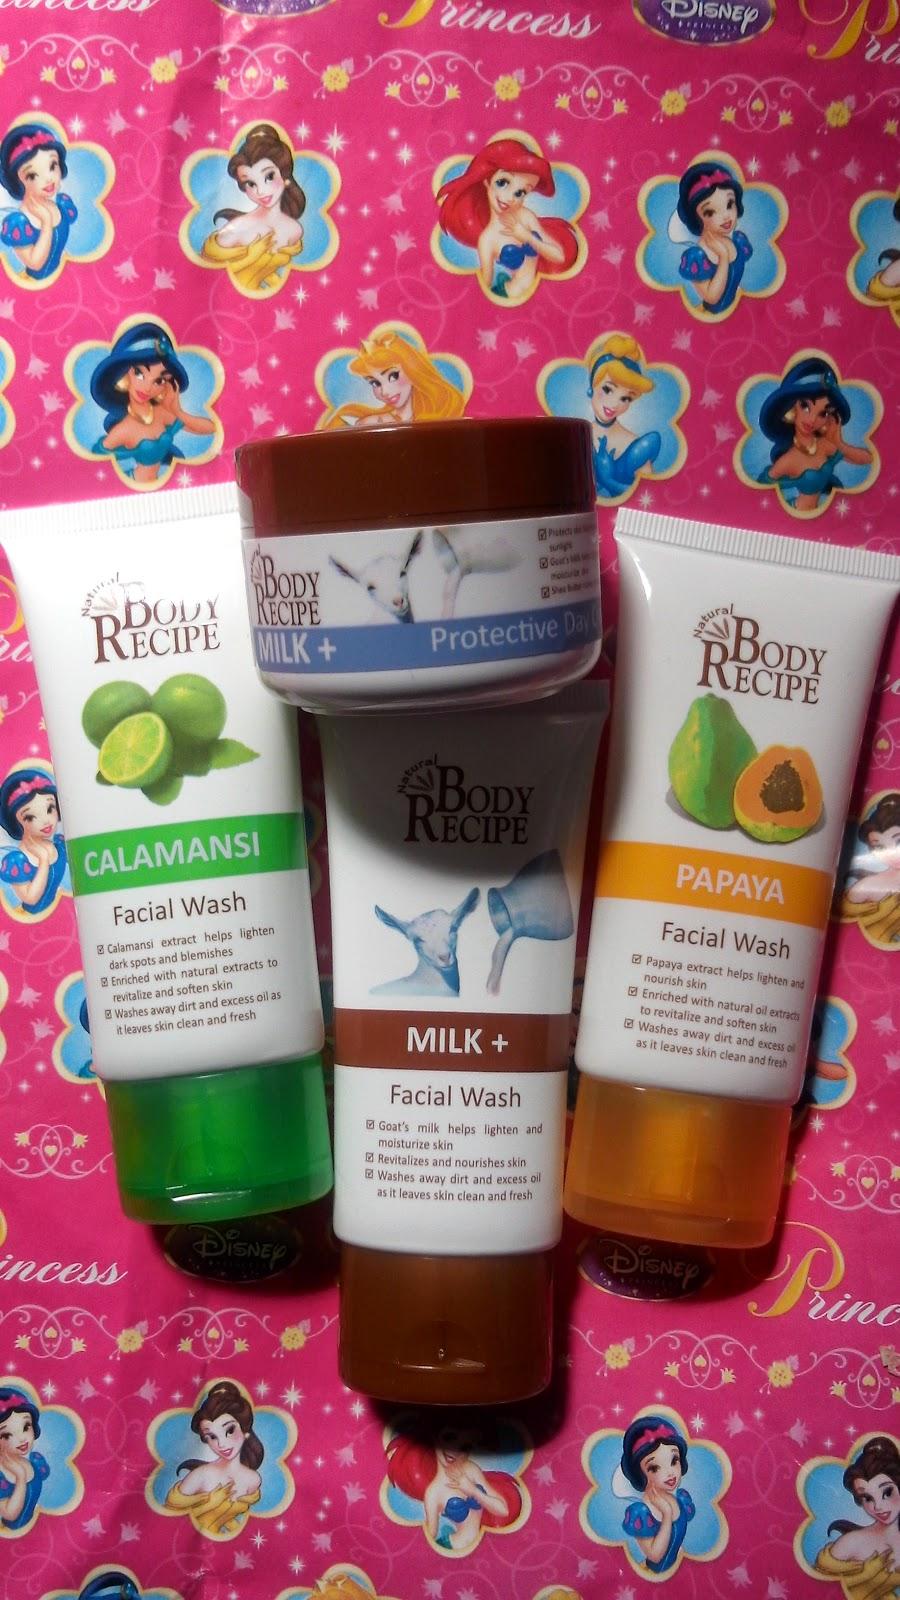 Natural Body Recipe Milk+ Protective Day Cream, Calamansi, Milk+ and Papaya Facial Wash